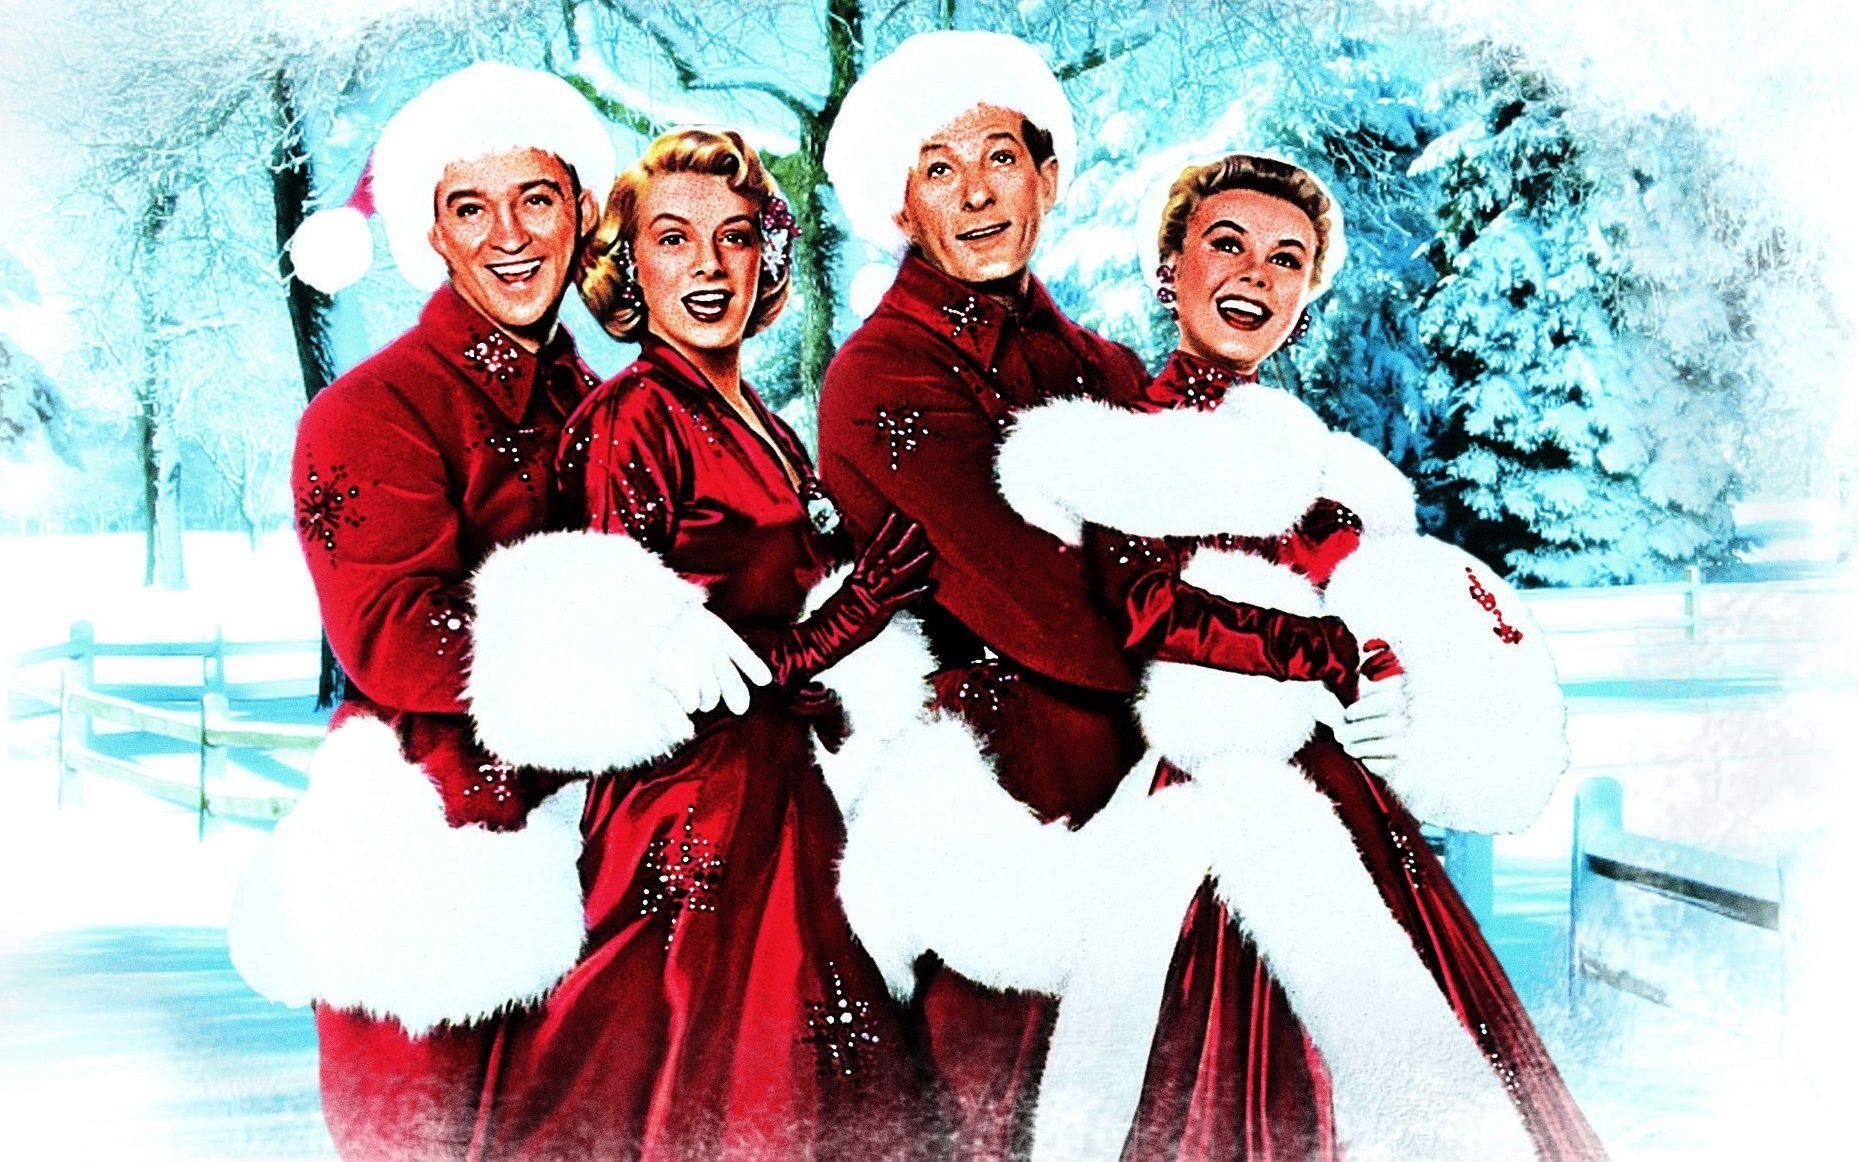 Bing Crosby, Rosemary Clooney, Dany Kaye and Vera Elllen in White Christmas, 1954 (Allstar/PARAMOUNT)